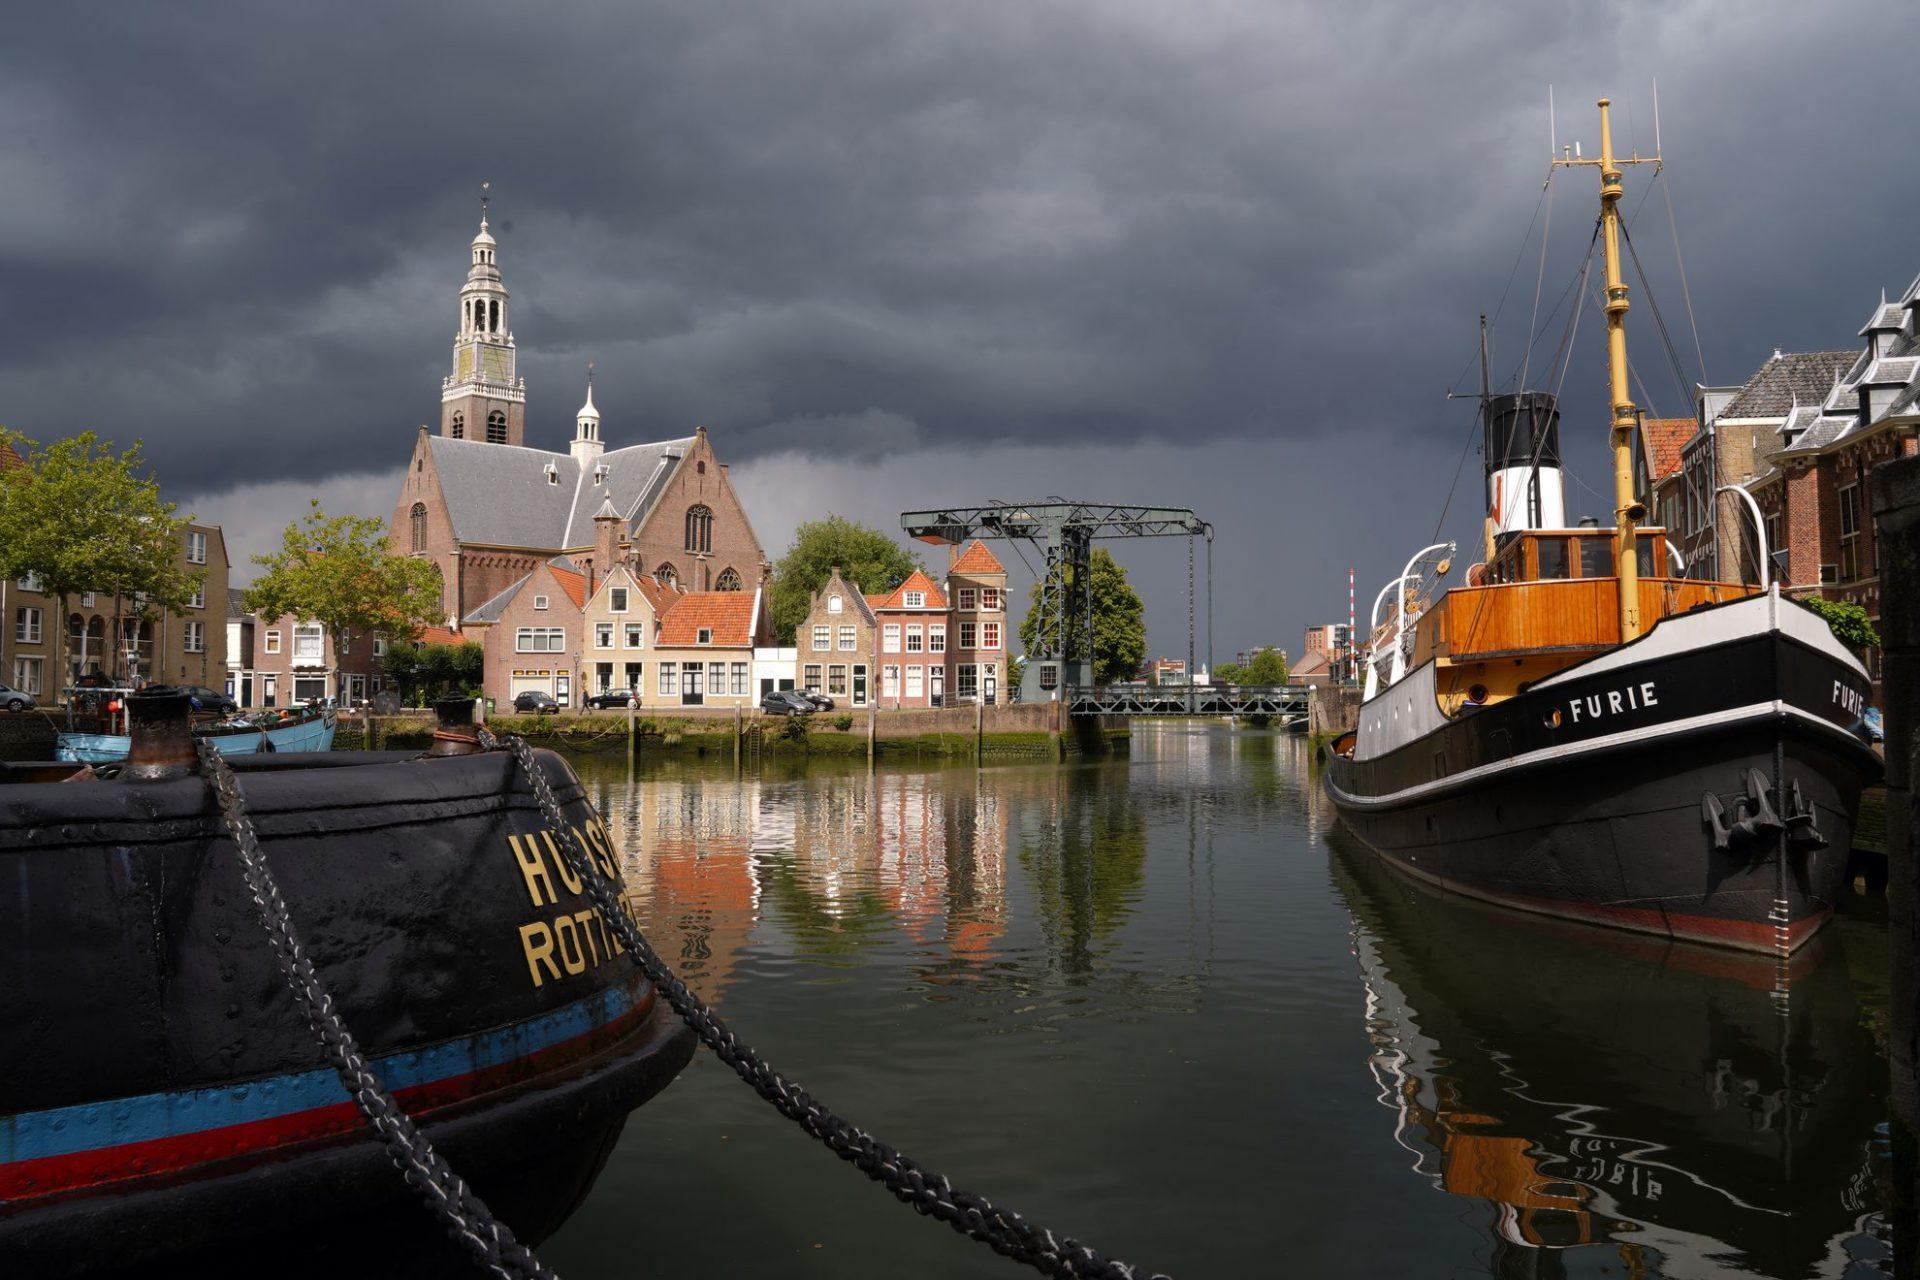 holland-2019-08-13-12-15-20-ilce-7m3-02-14-1-1920x1280.jpg